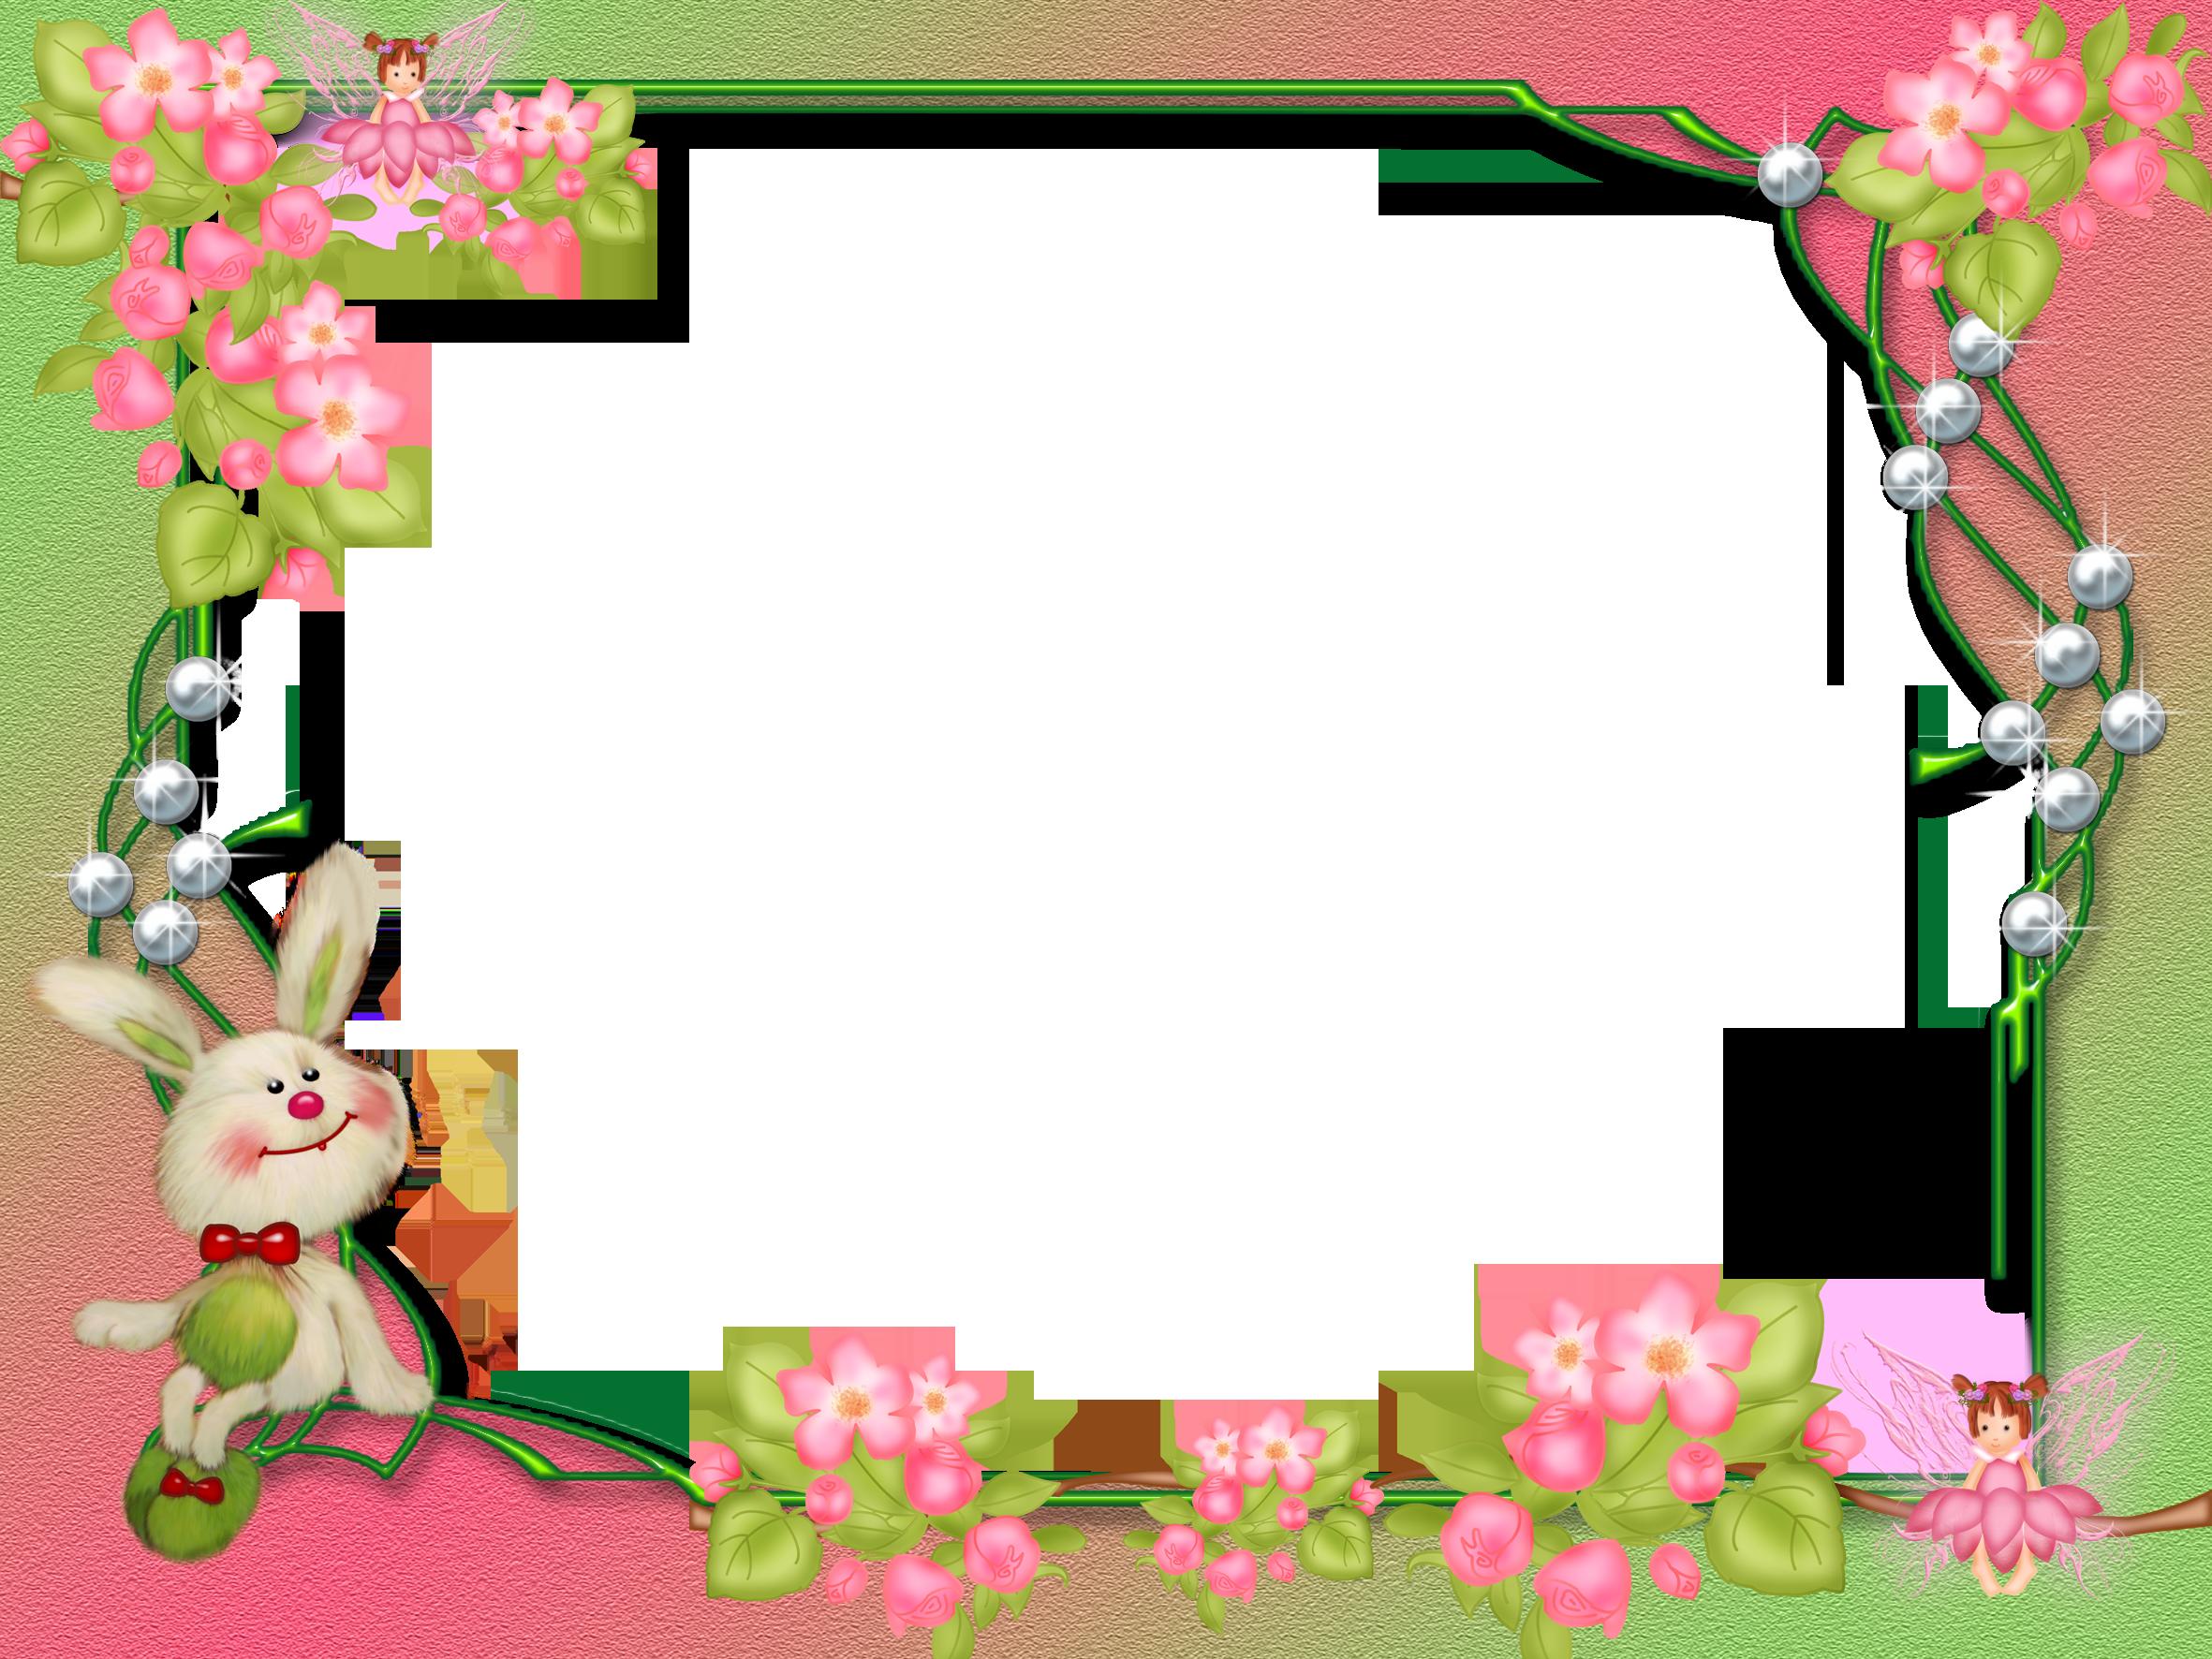 Small Frame - Bunny & Flowers   borders & frames   Pinterest   Bunny ...